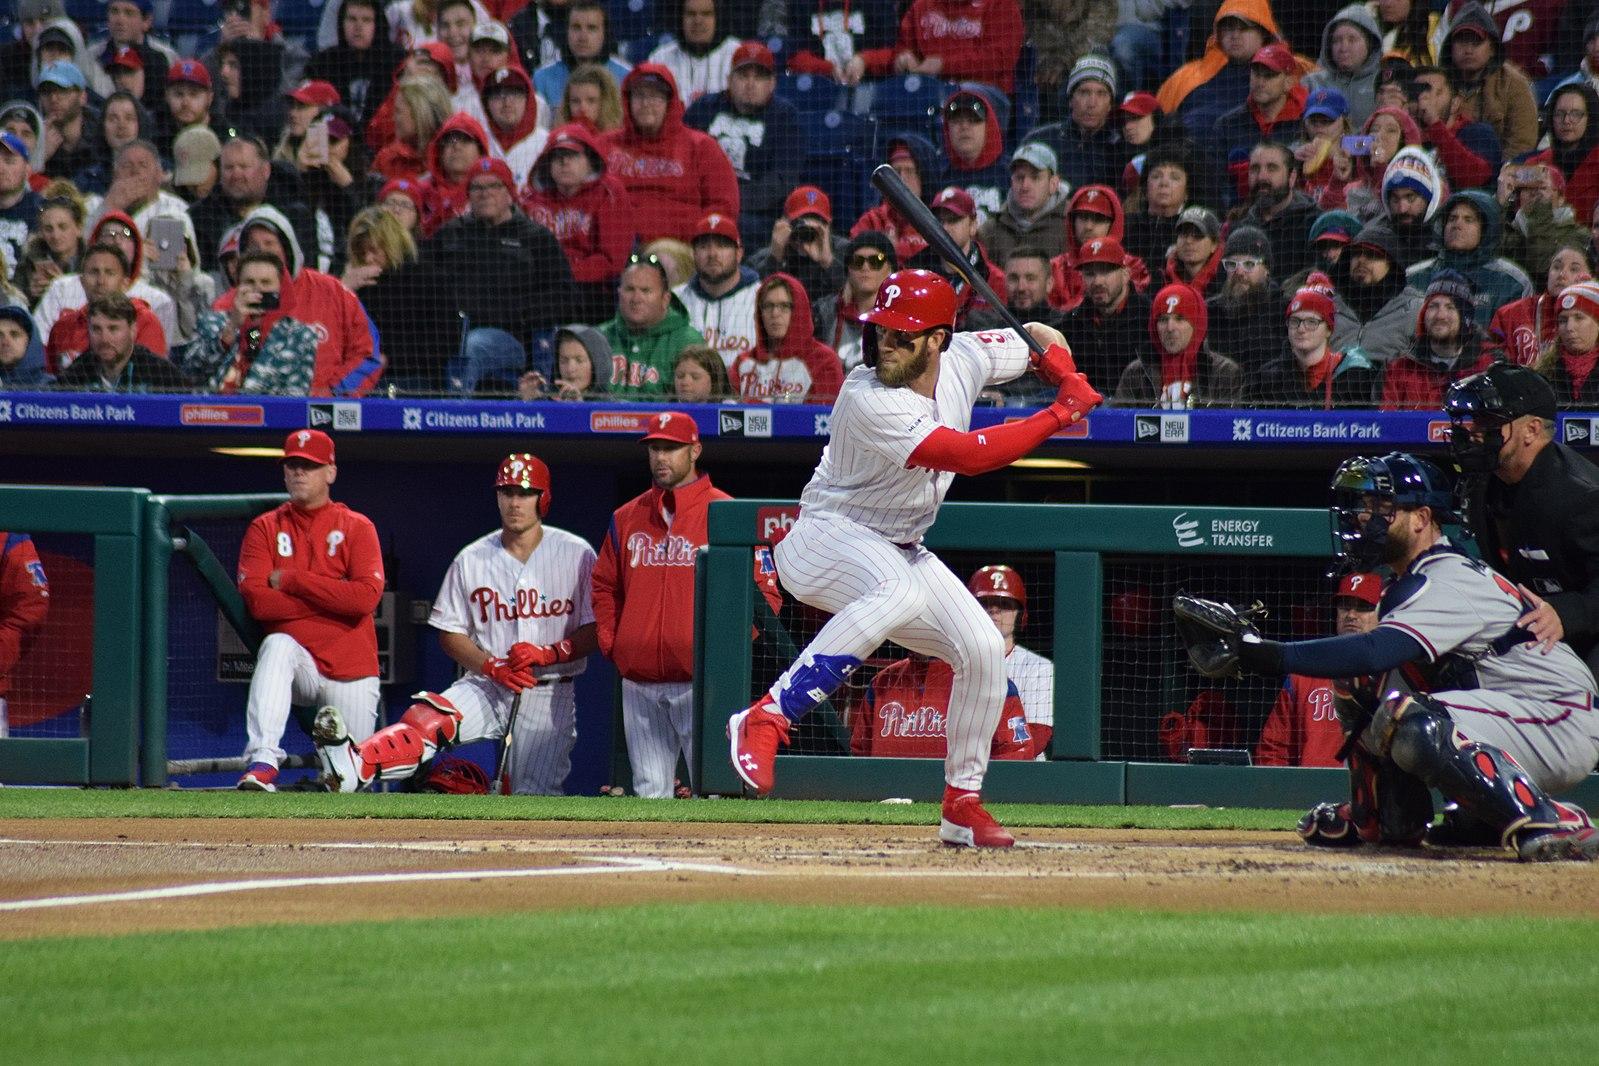 MLB Predictions on Where the Philadelphia Phillies Will Finish the 2021 Season